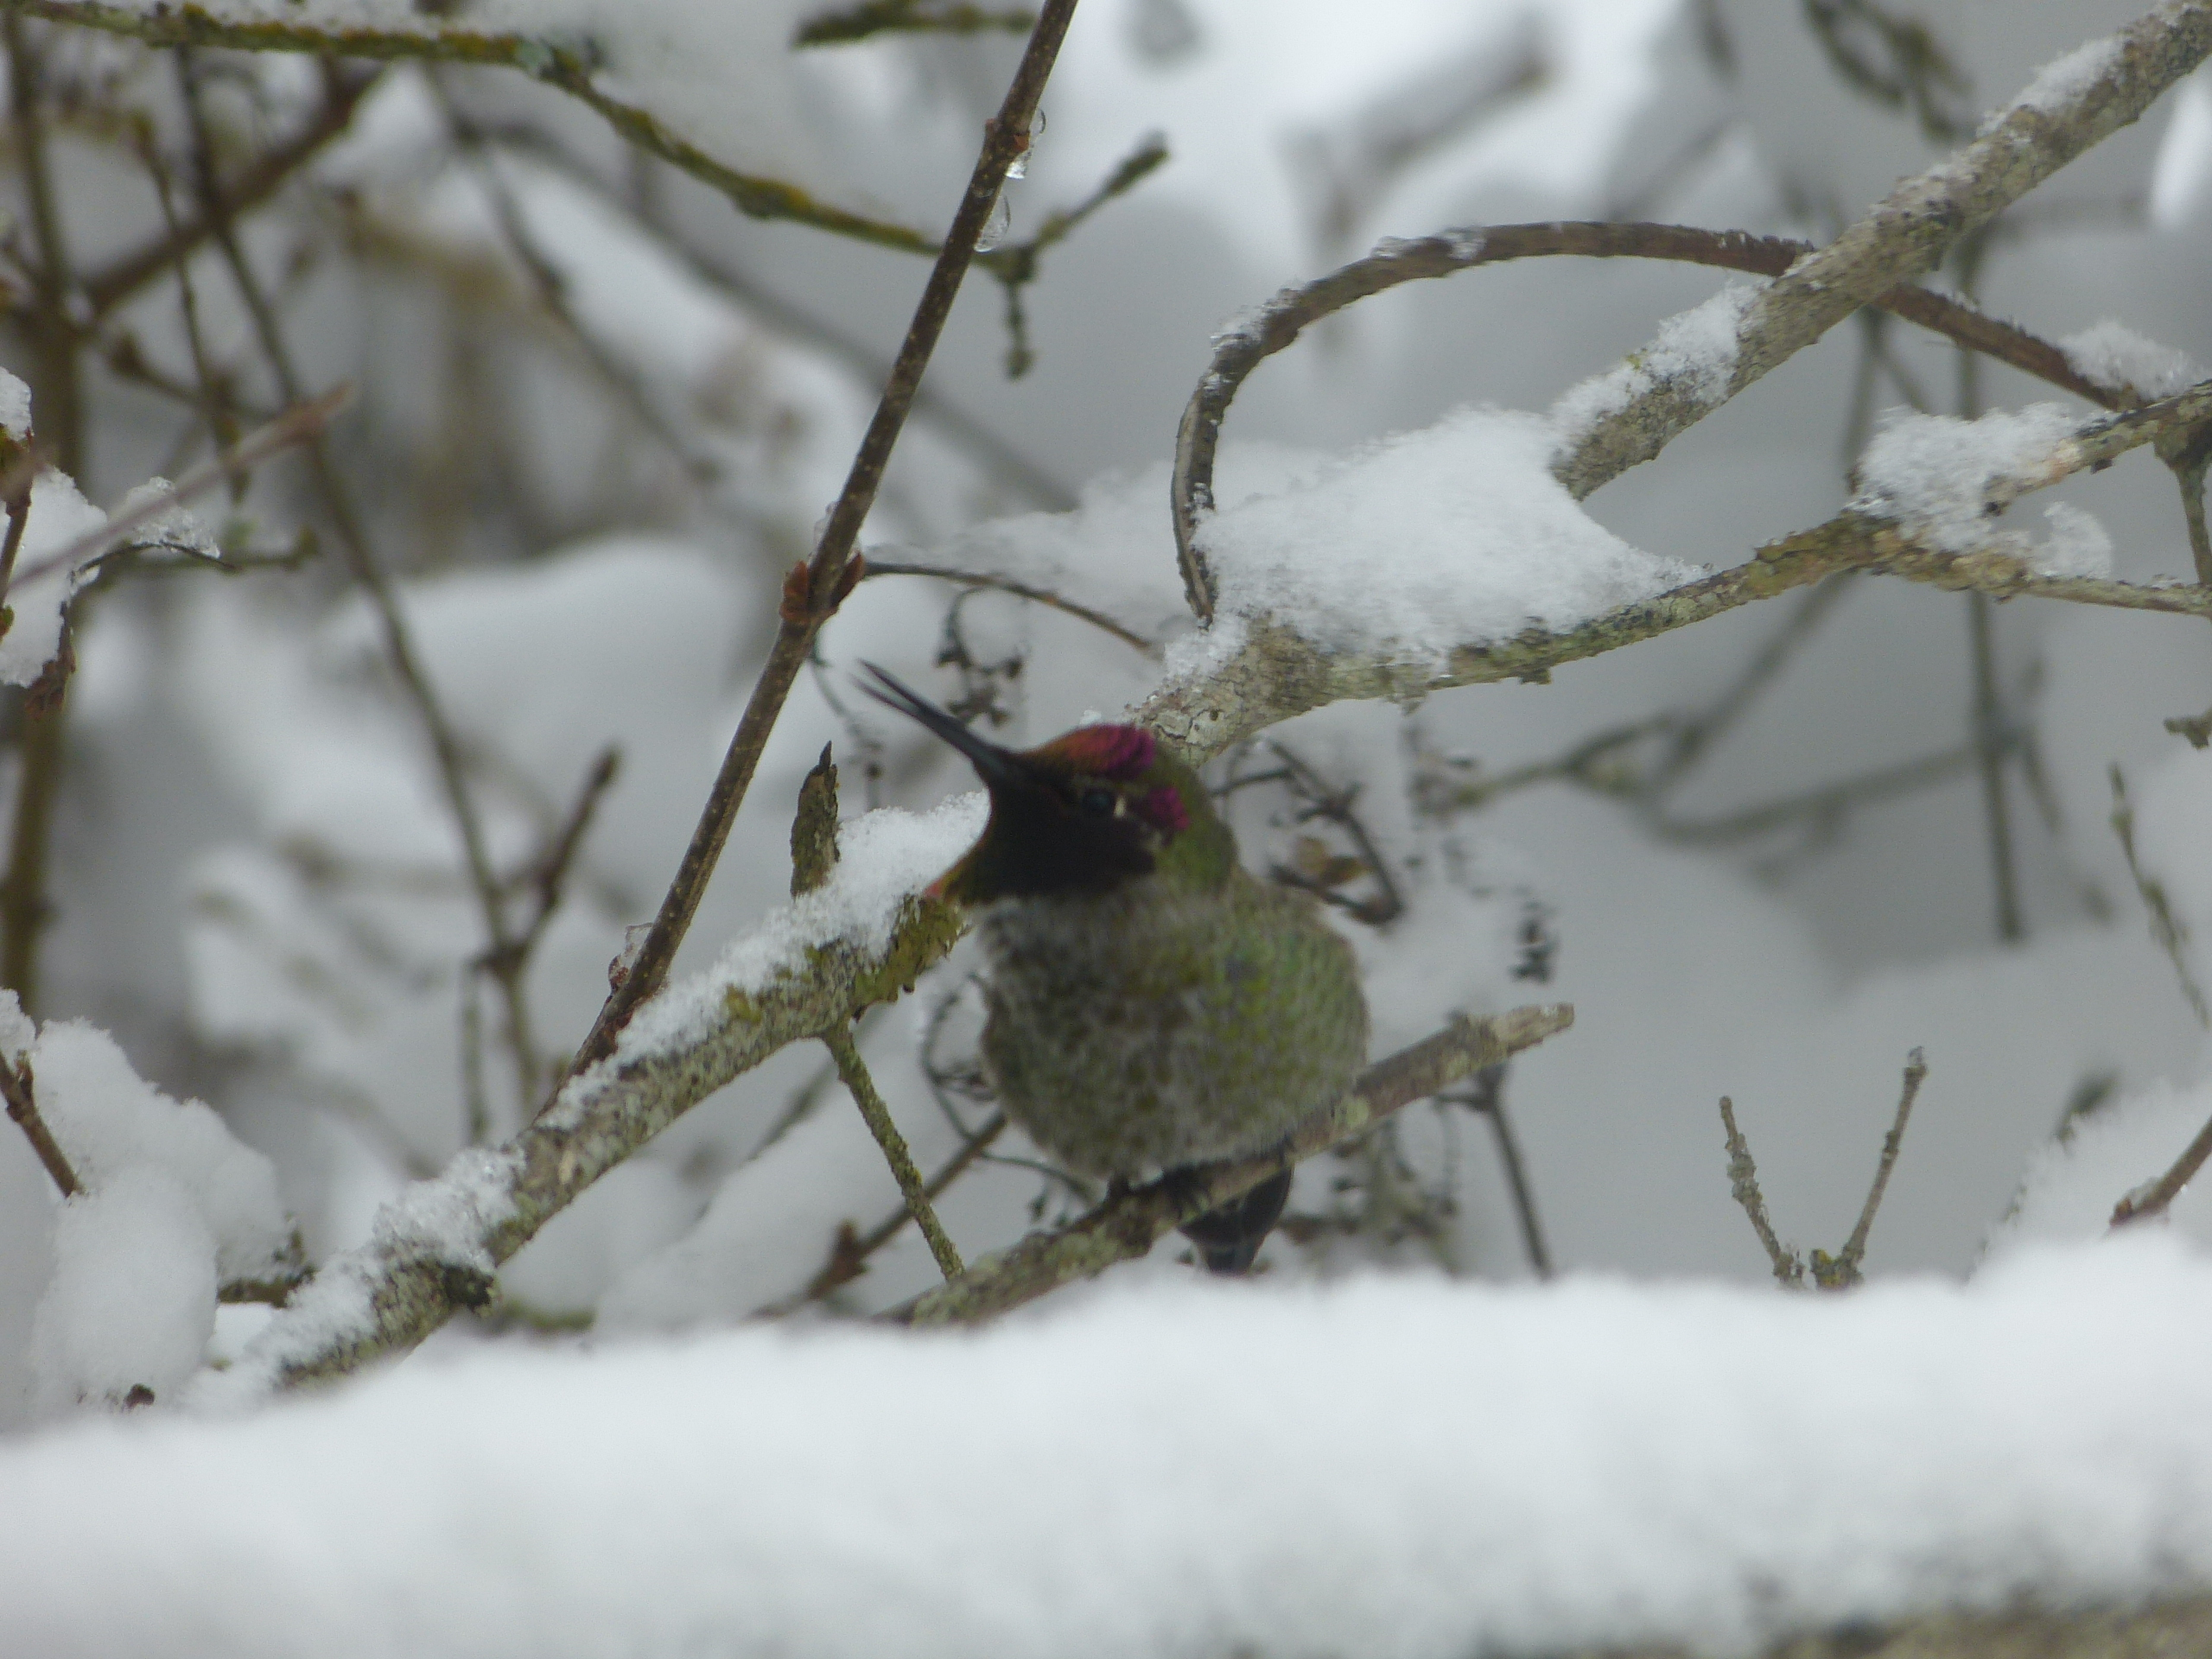 """Tictoc"", a hummingbird, in a snowy lilac."